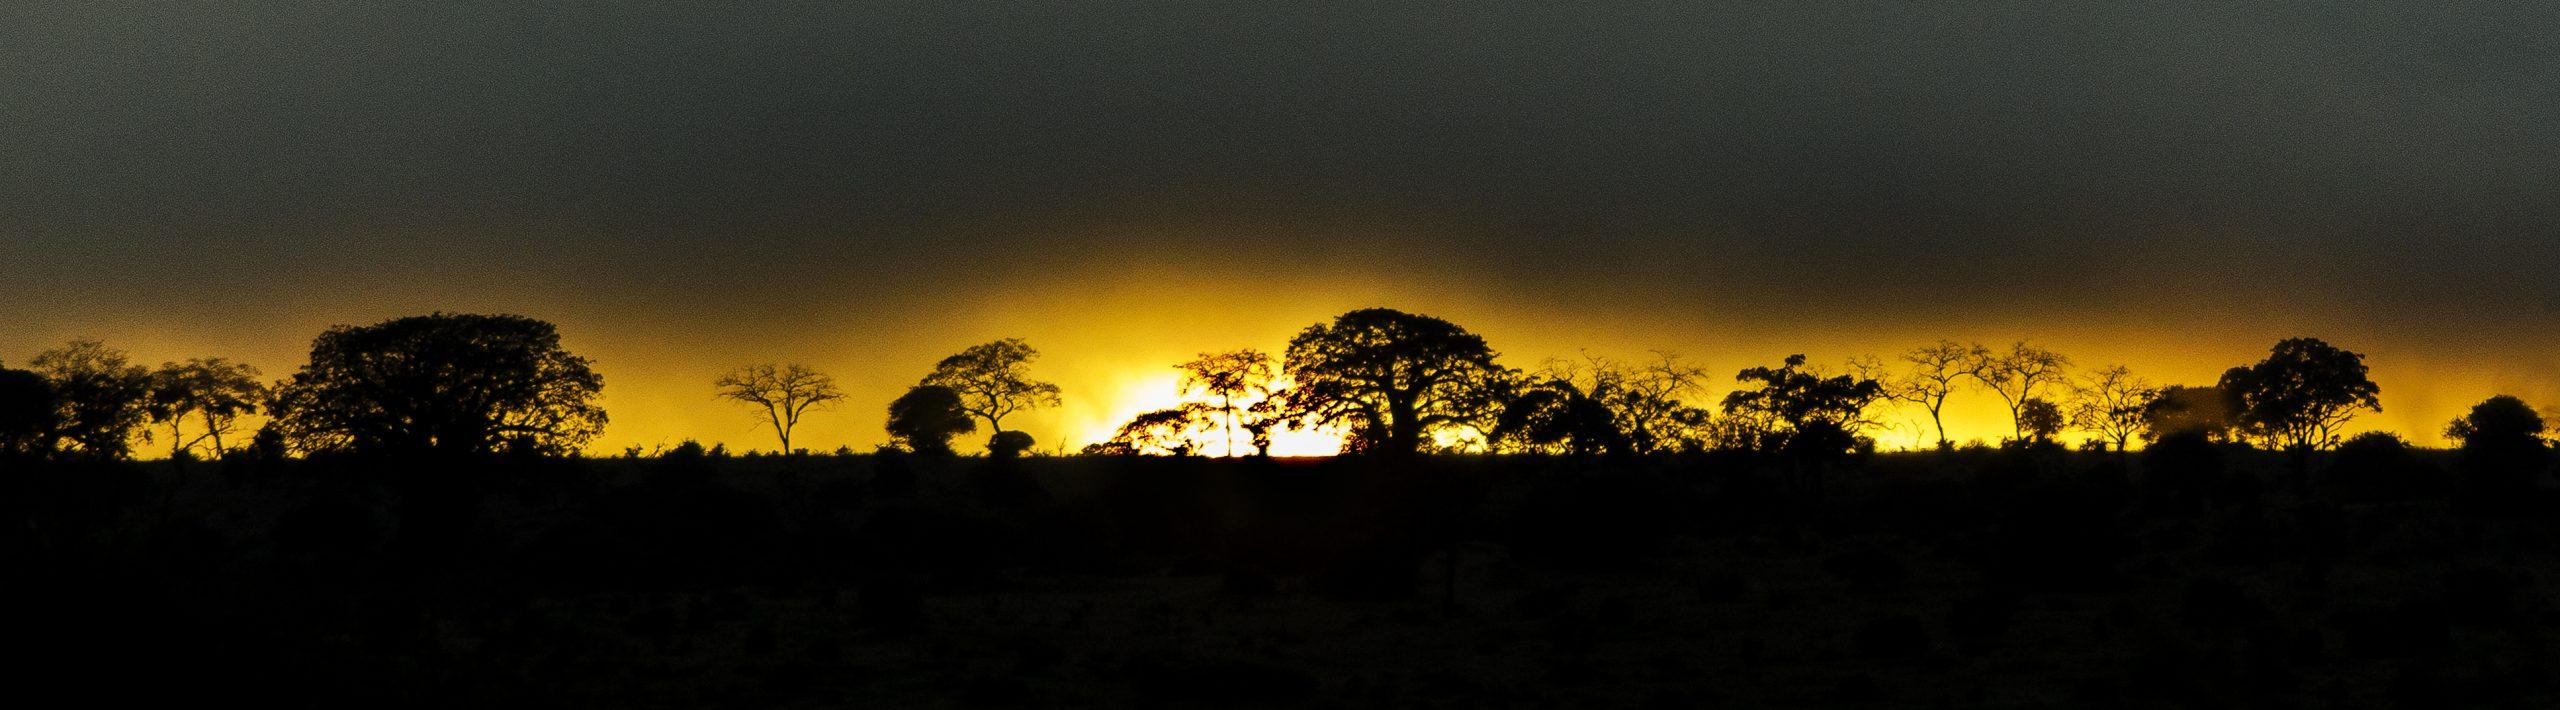 PhotoFly Travel Club | Tanzania Sunet | PhotoFly Travel Club